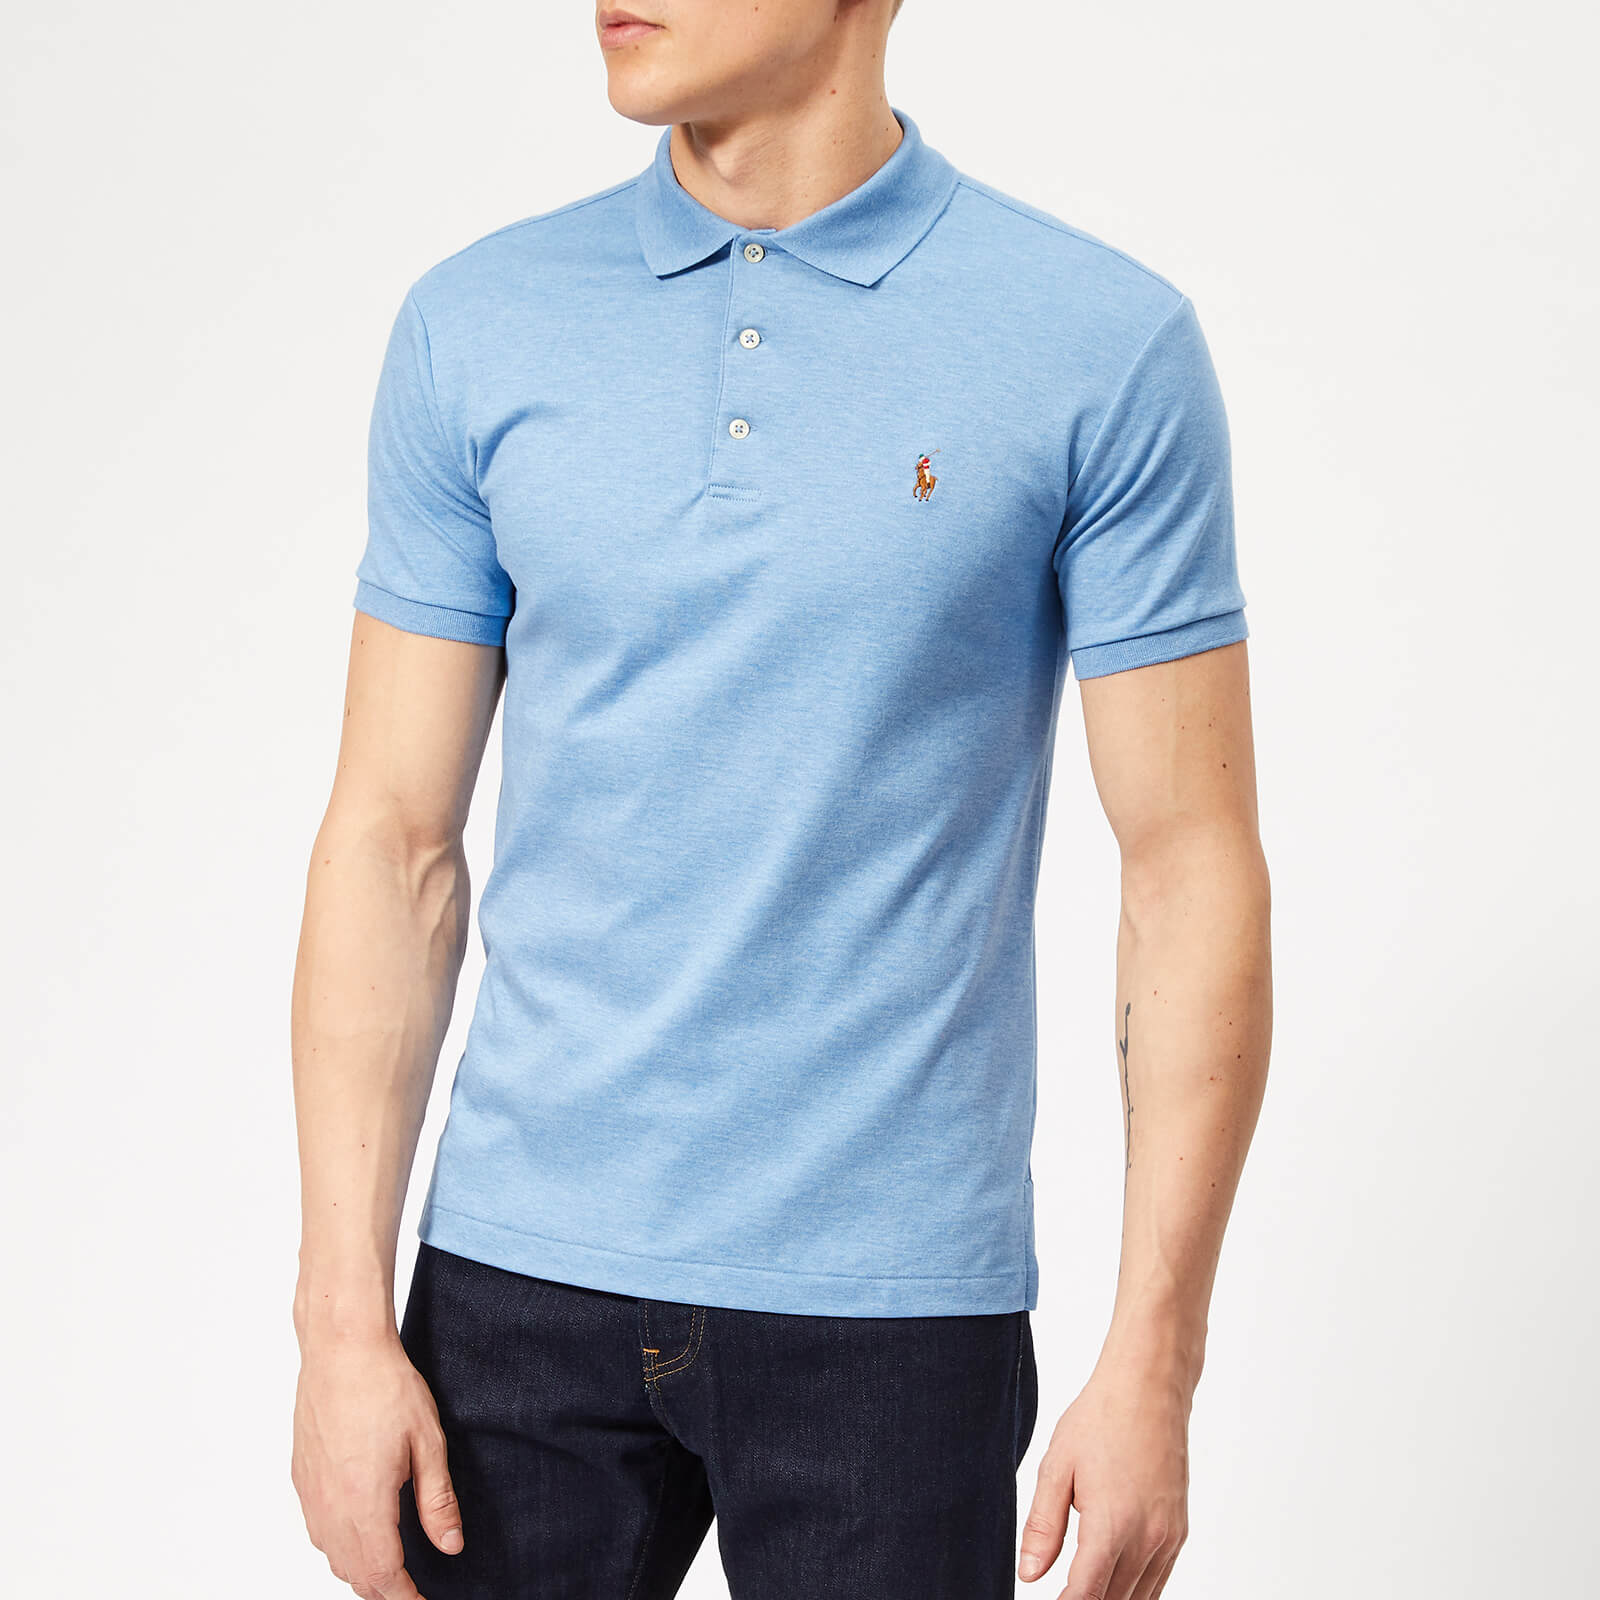 Shirt Ralph Pima Fit Heather Royal Slim Lauren Polo Soft Men's Cotton PNOZ8nkX0w